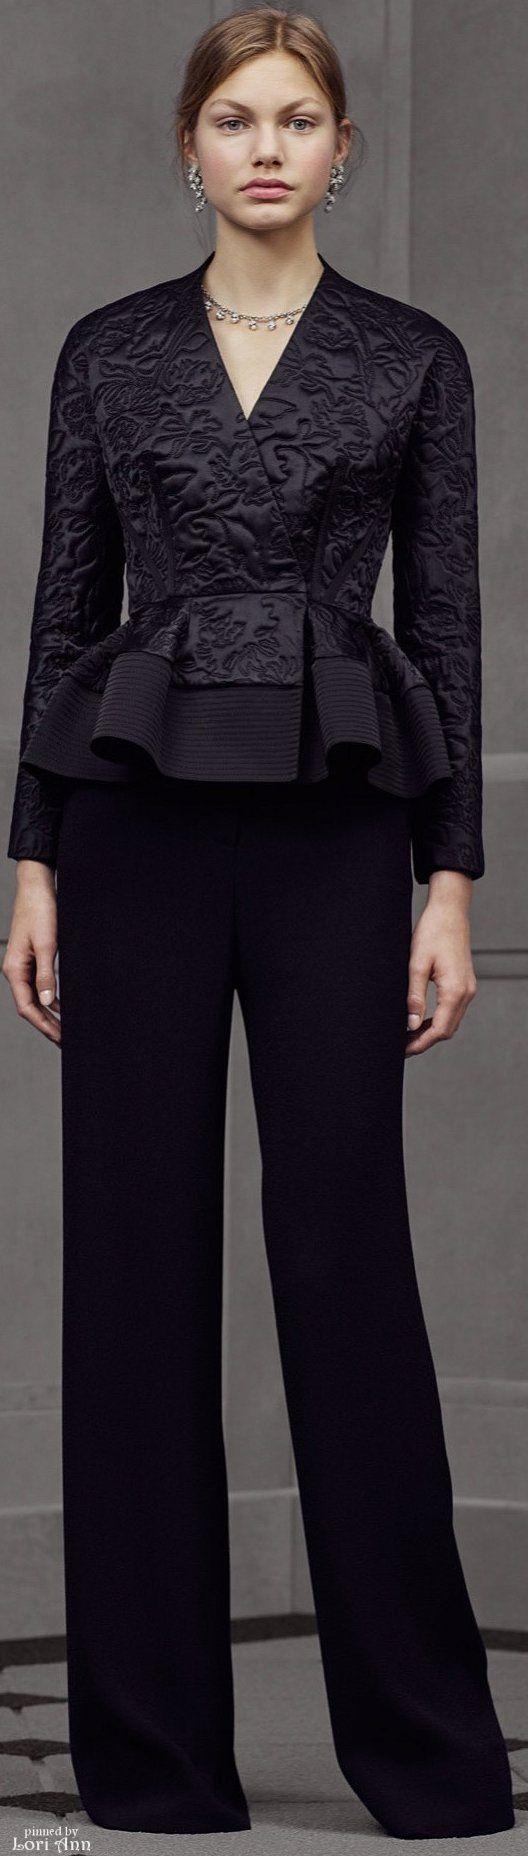 119 Best Fashion In 21 Century Images On Pinterest Coats Woman Tendencies Tshirt Ny Life Hitam L Living A Beautiful Balenciaga Resort 2016